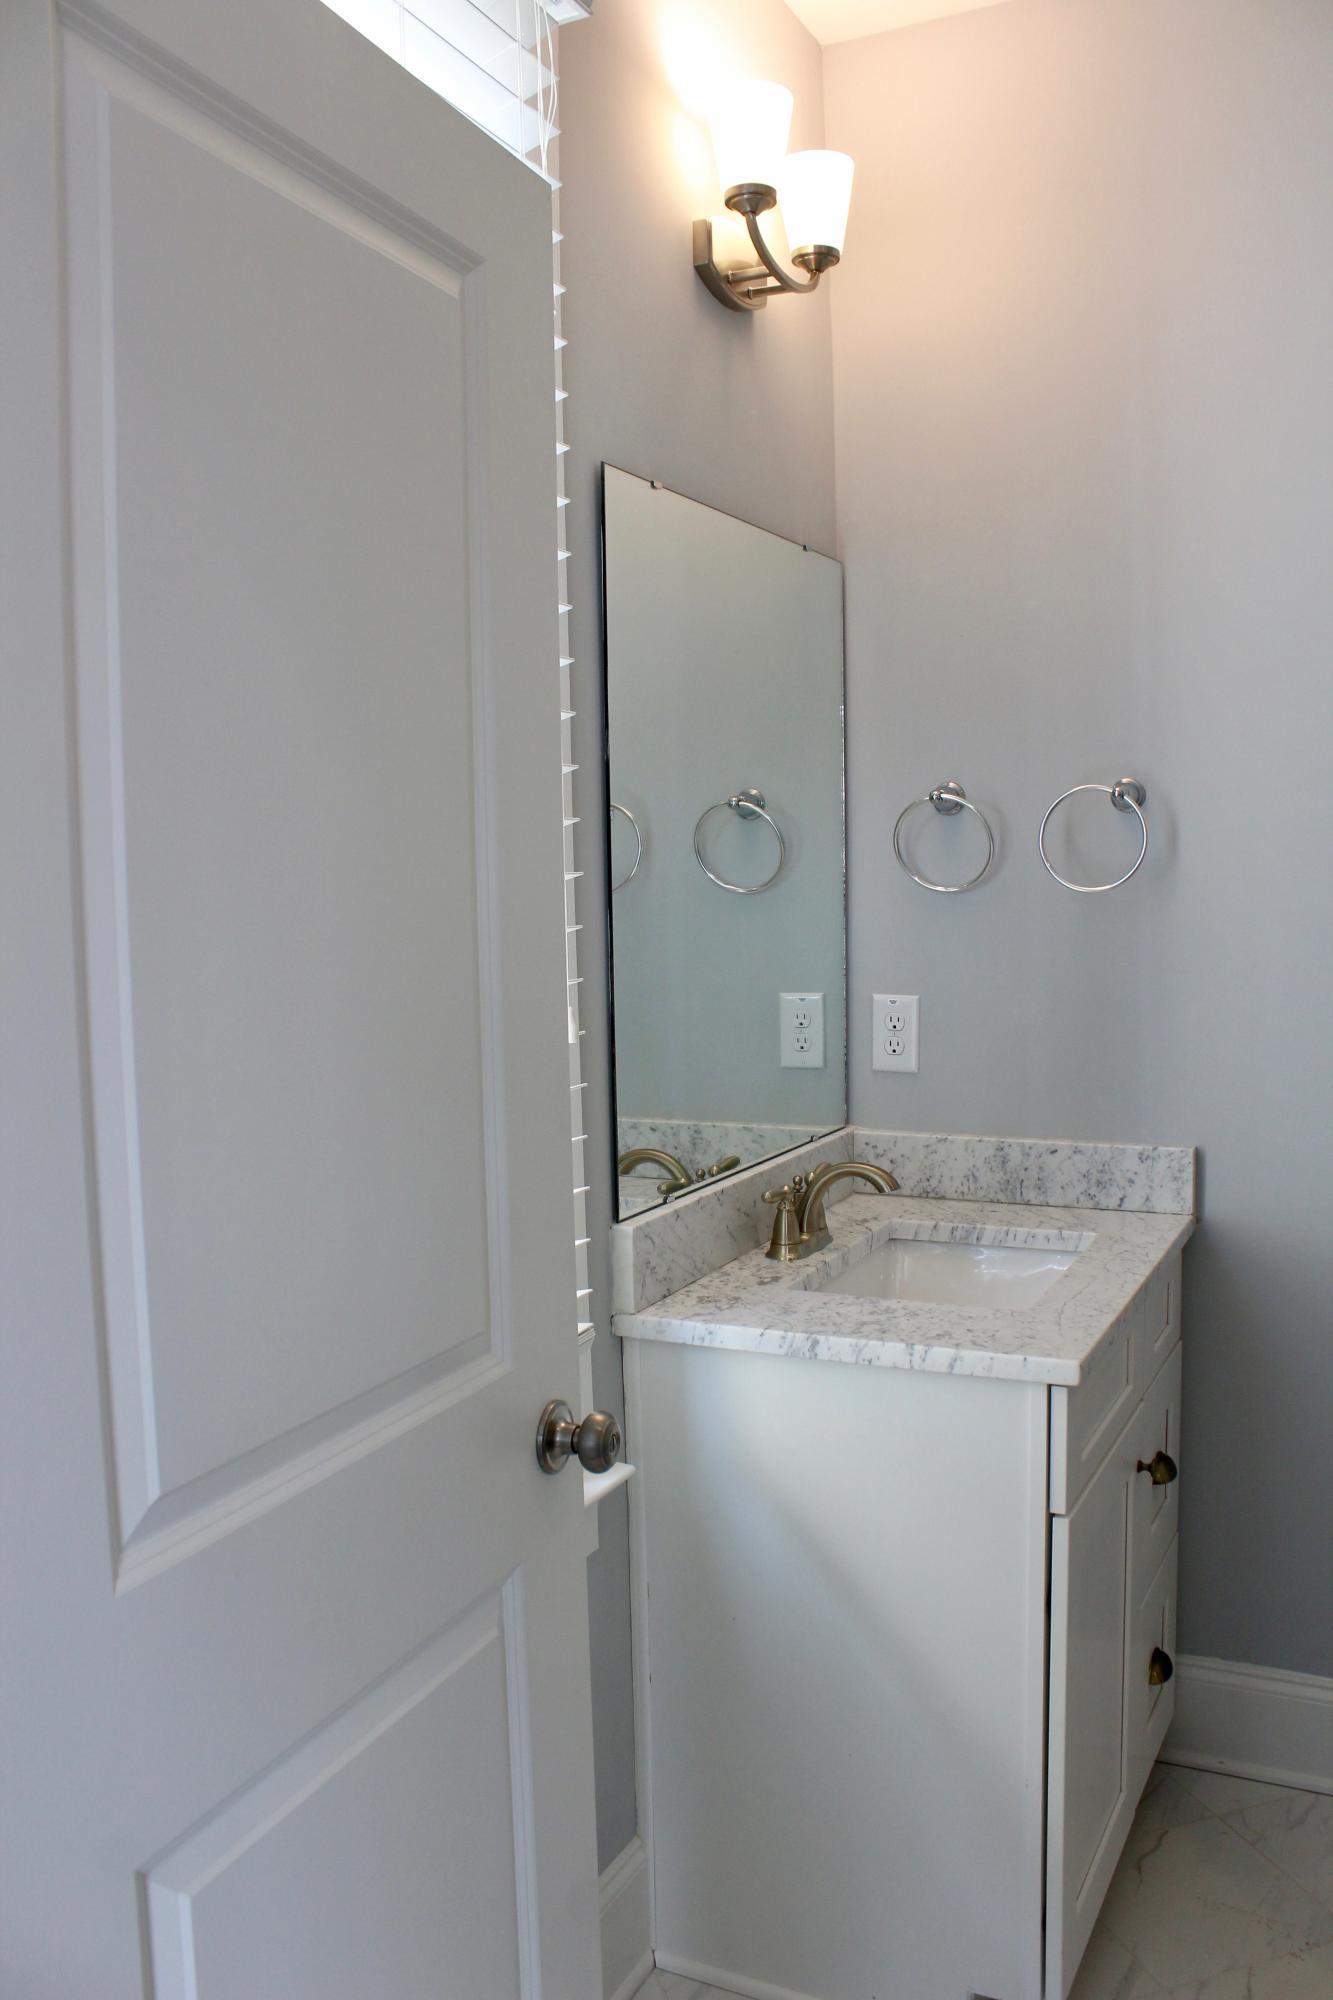 Morris Square Homes For Sale - 46 Dereef, Charleston, SC - 20